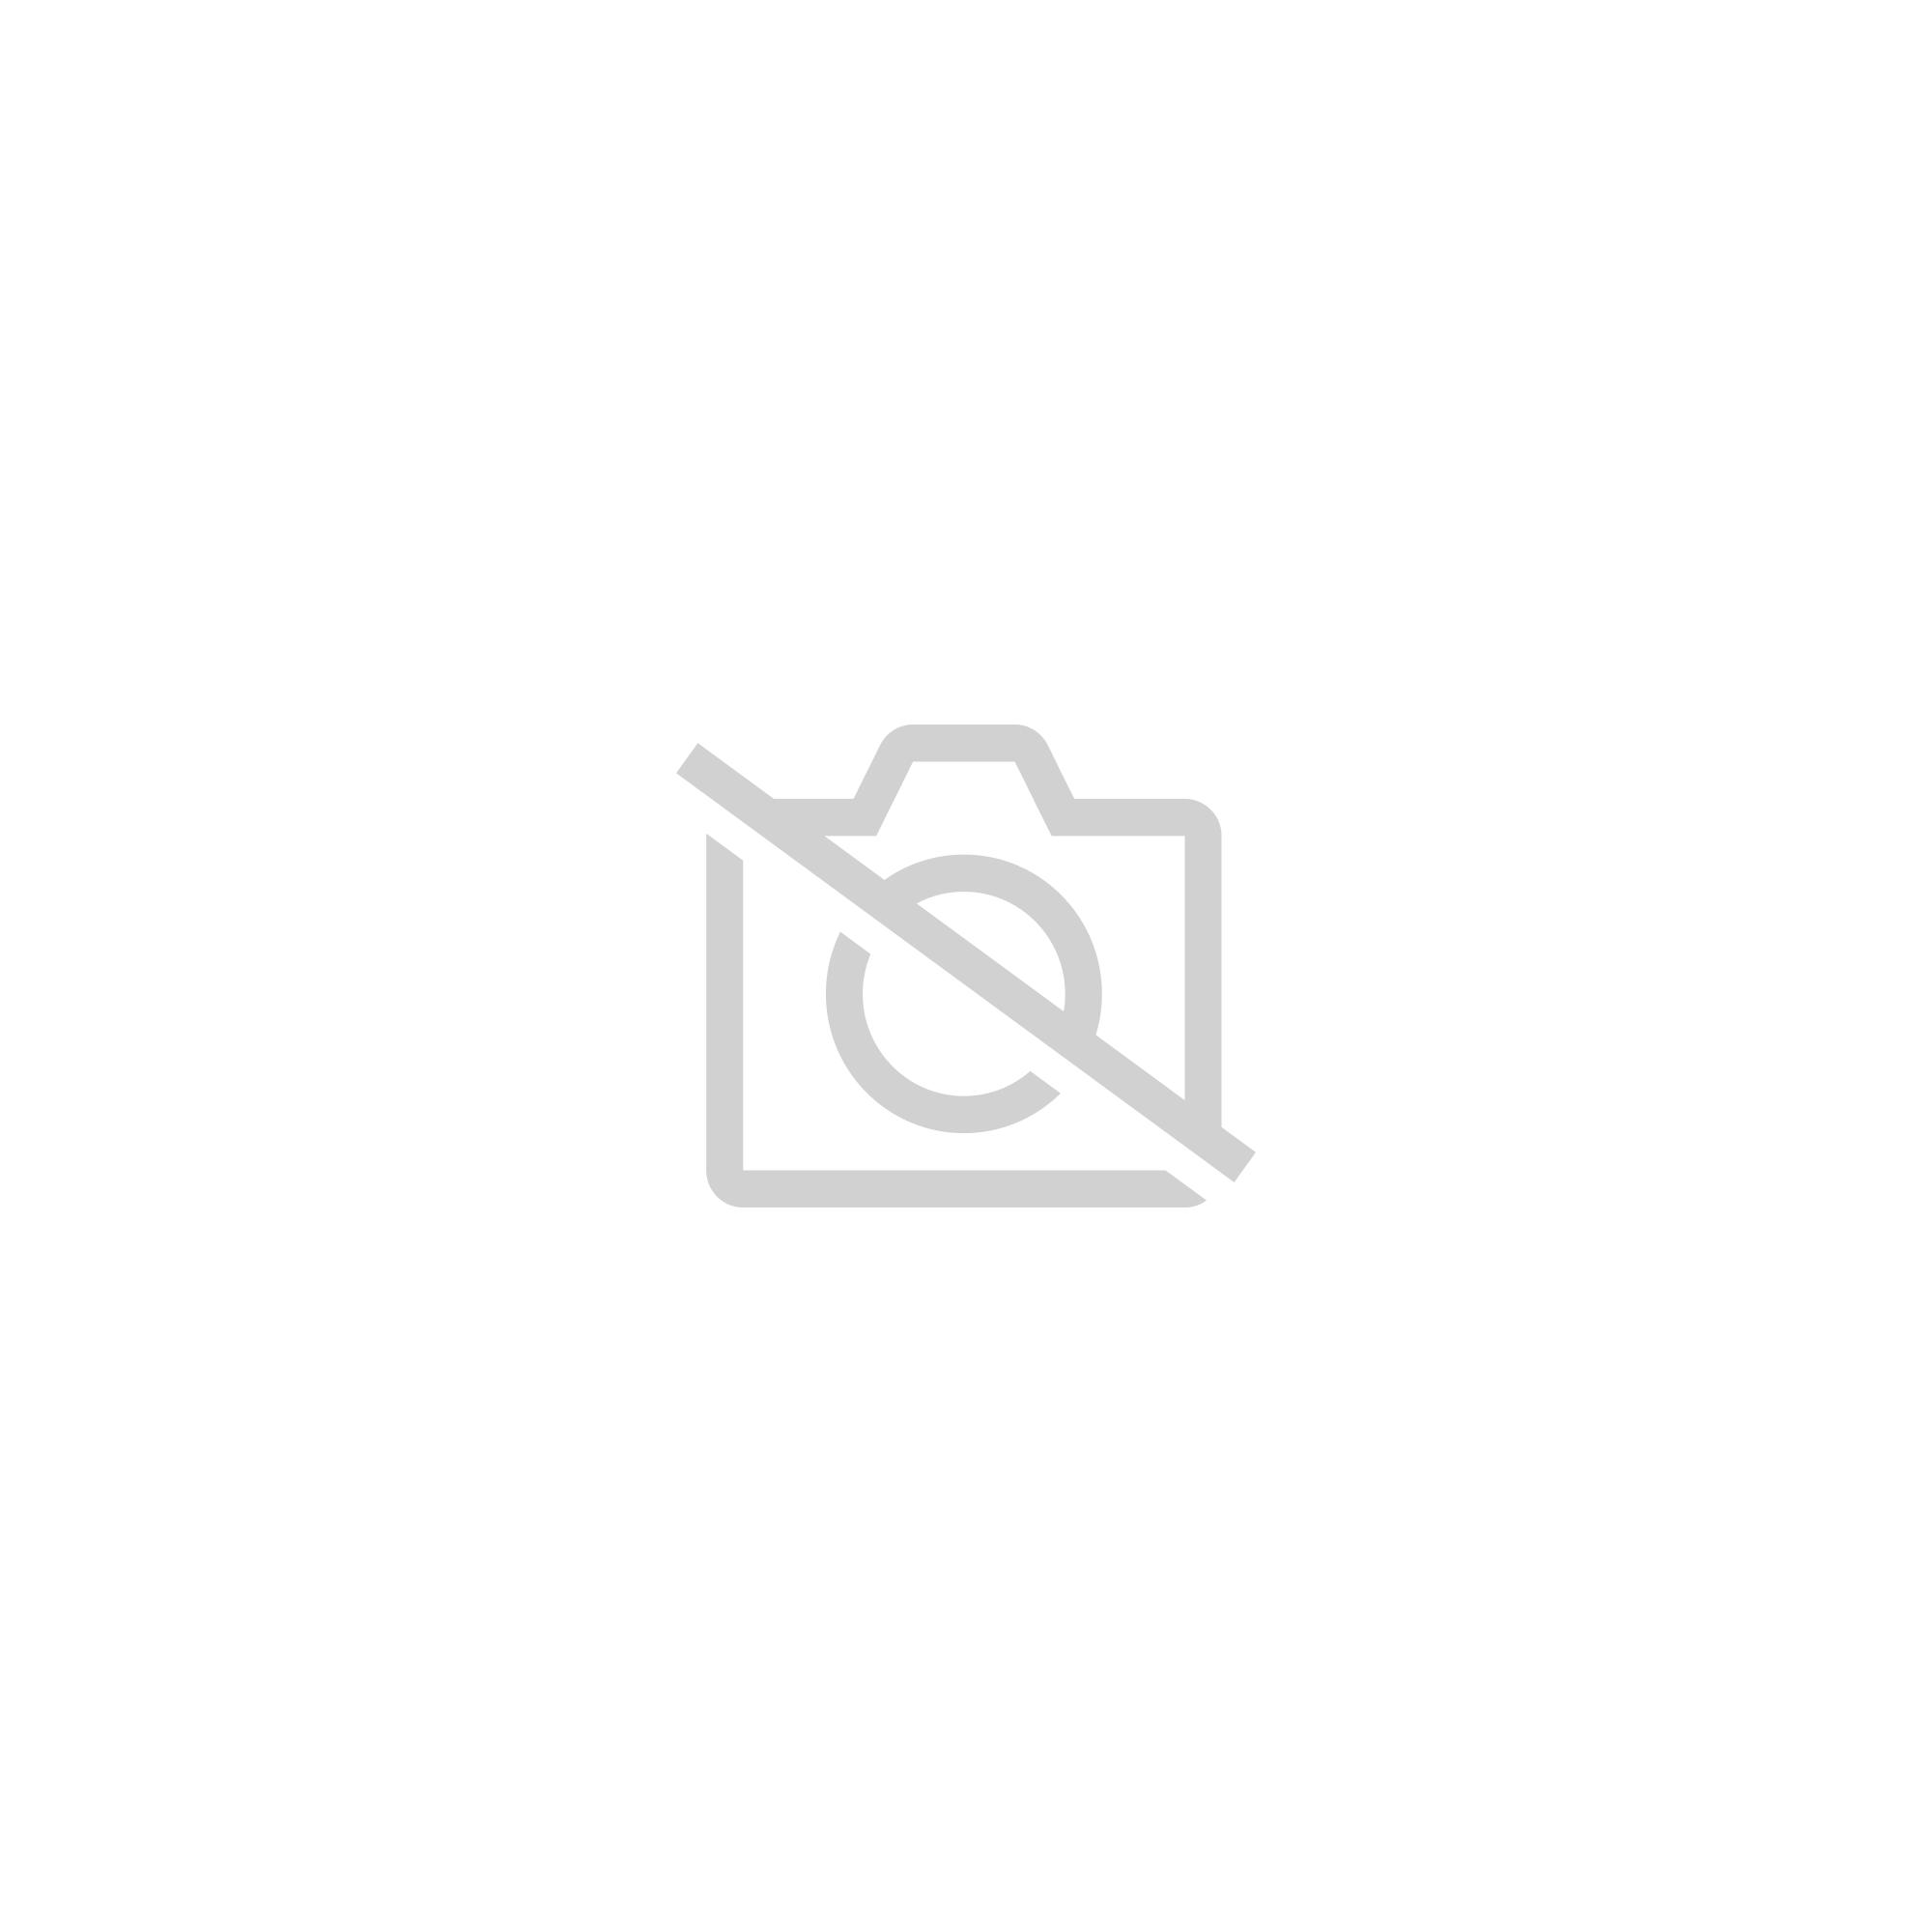 Chaussures Pour Femme Achat, Vente Neuf & D'occasion Rakuten